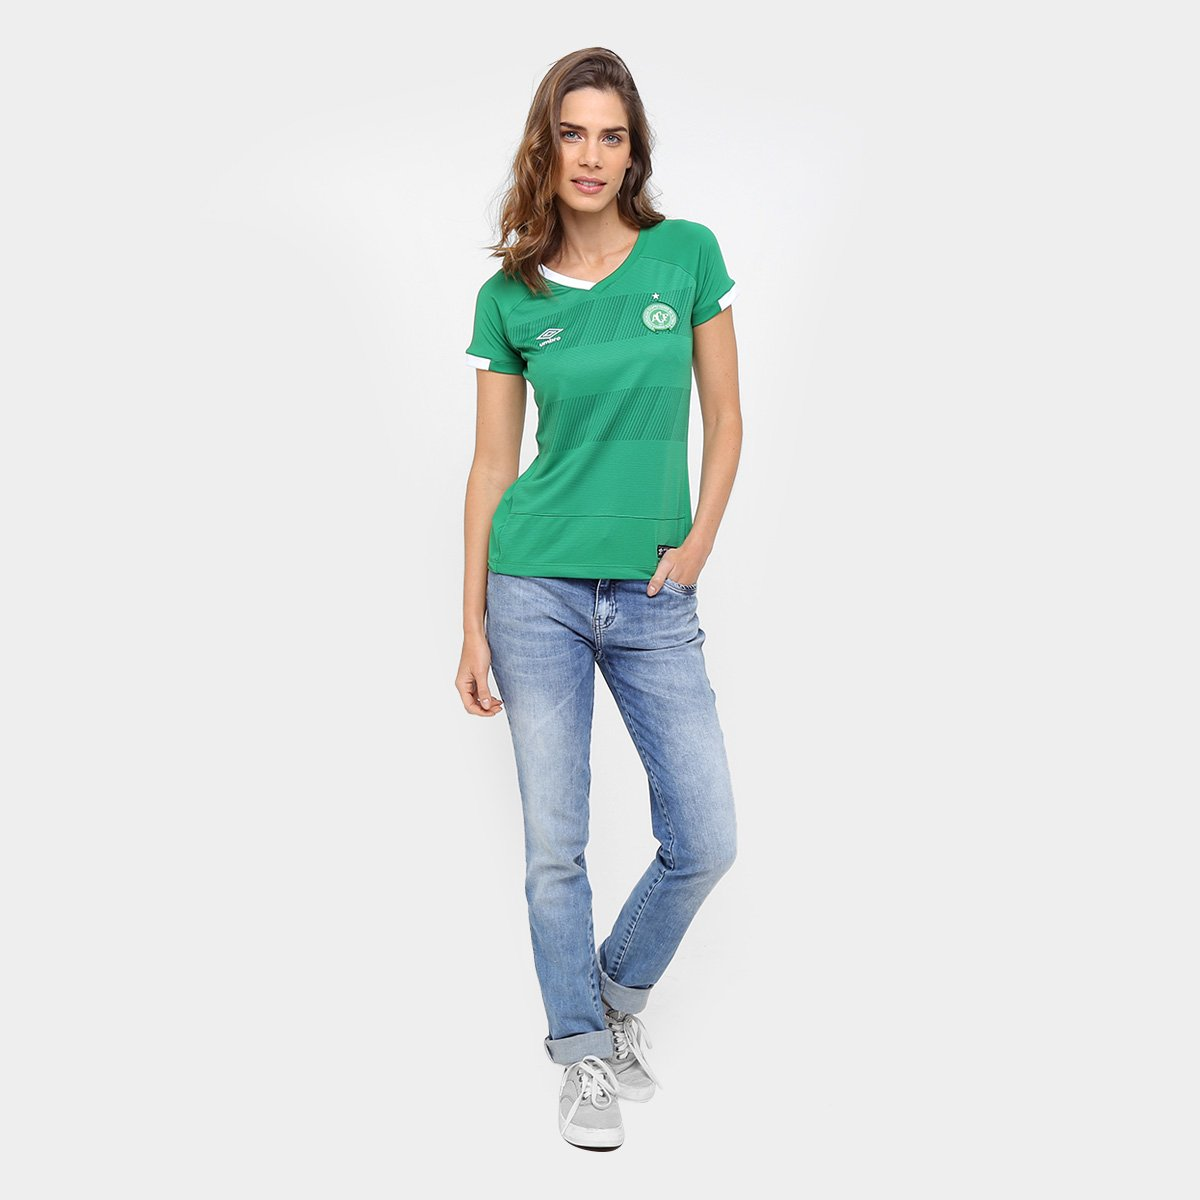 16 Chapecoense Camisa Torcedor 17 Verde I nº Umbro s Feminina ycCa6yR1